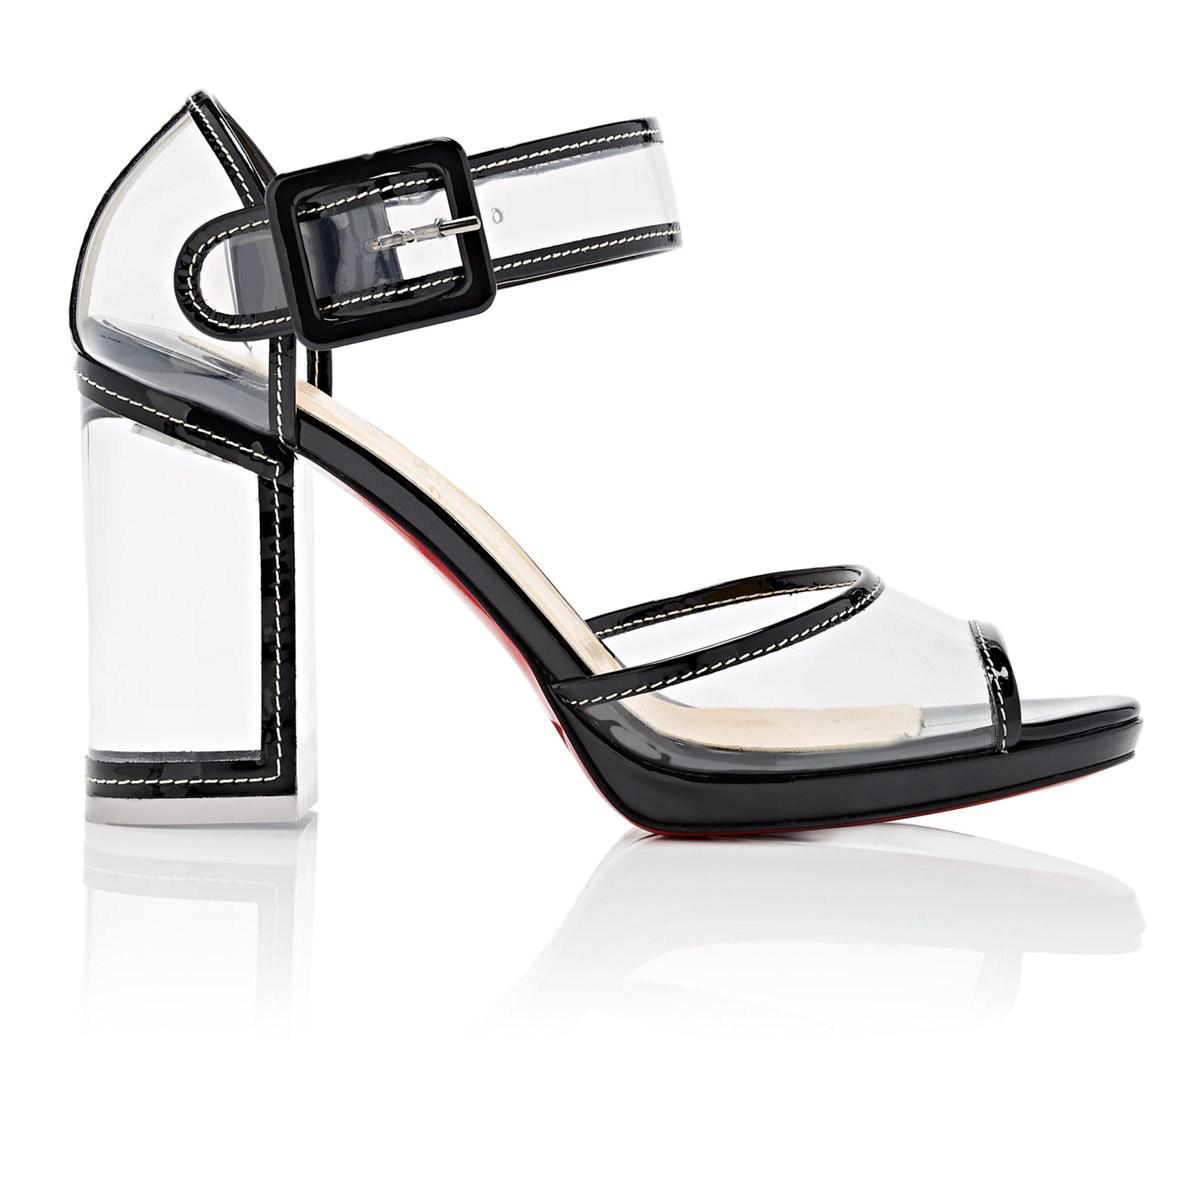 0aeb91e1caac ... canada christian louboutin. womens black barbaclara patent leather pvc  platform sandals 8b51d 24342